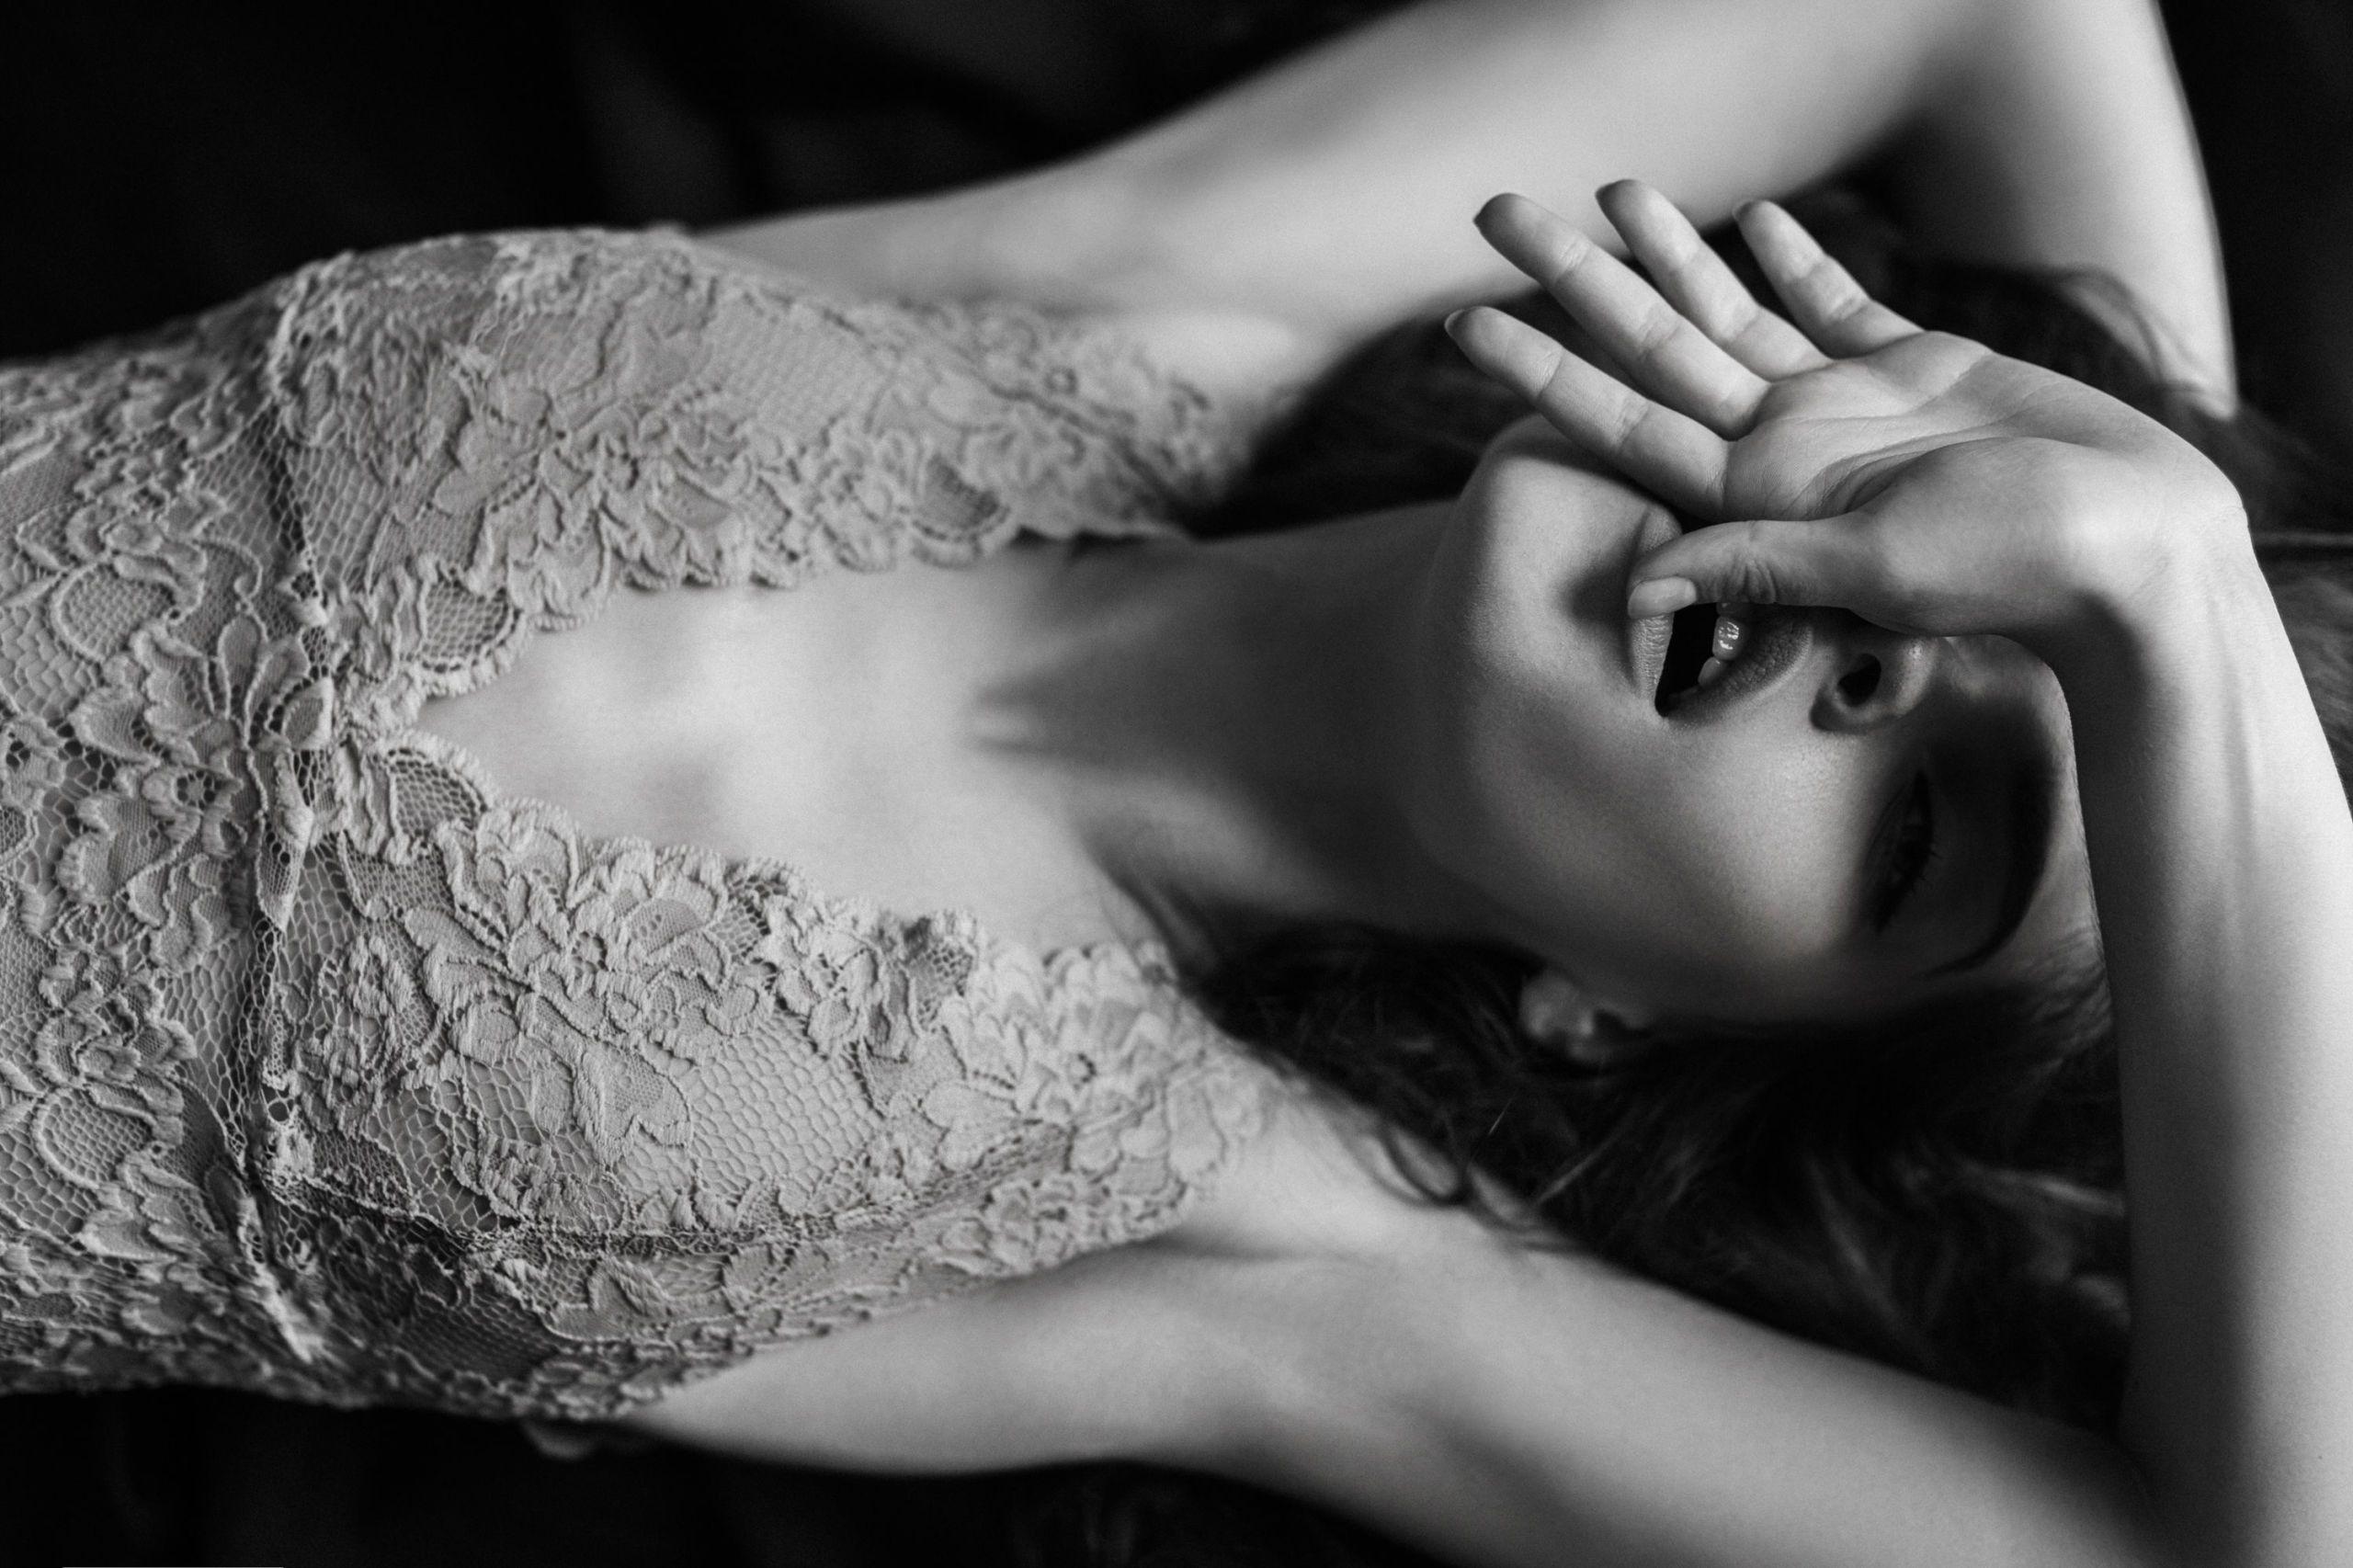 Polish nude model